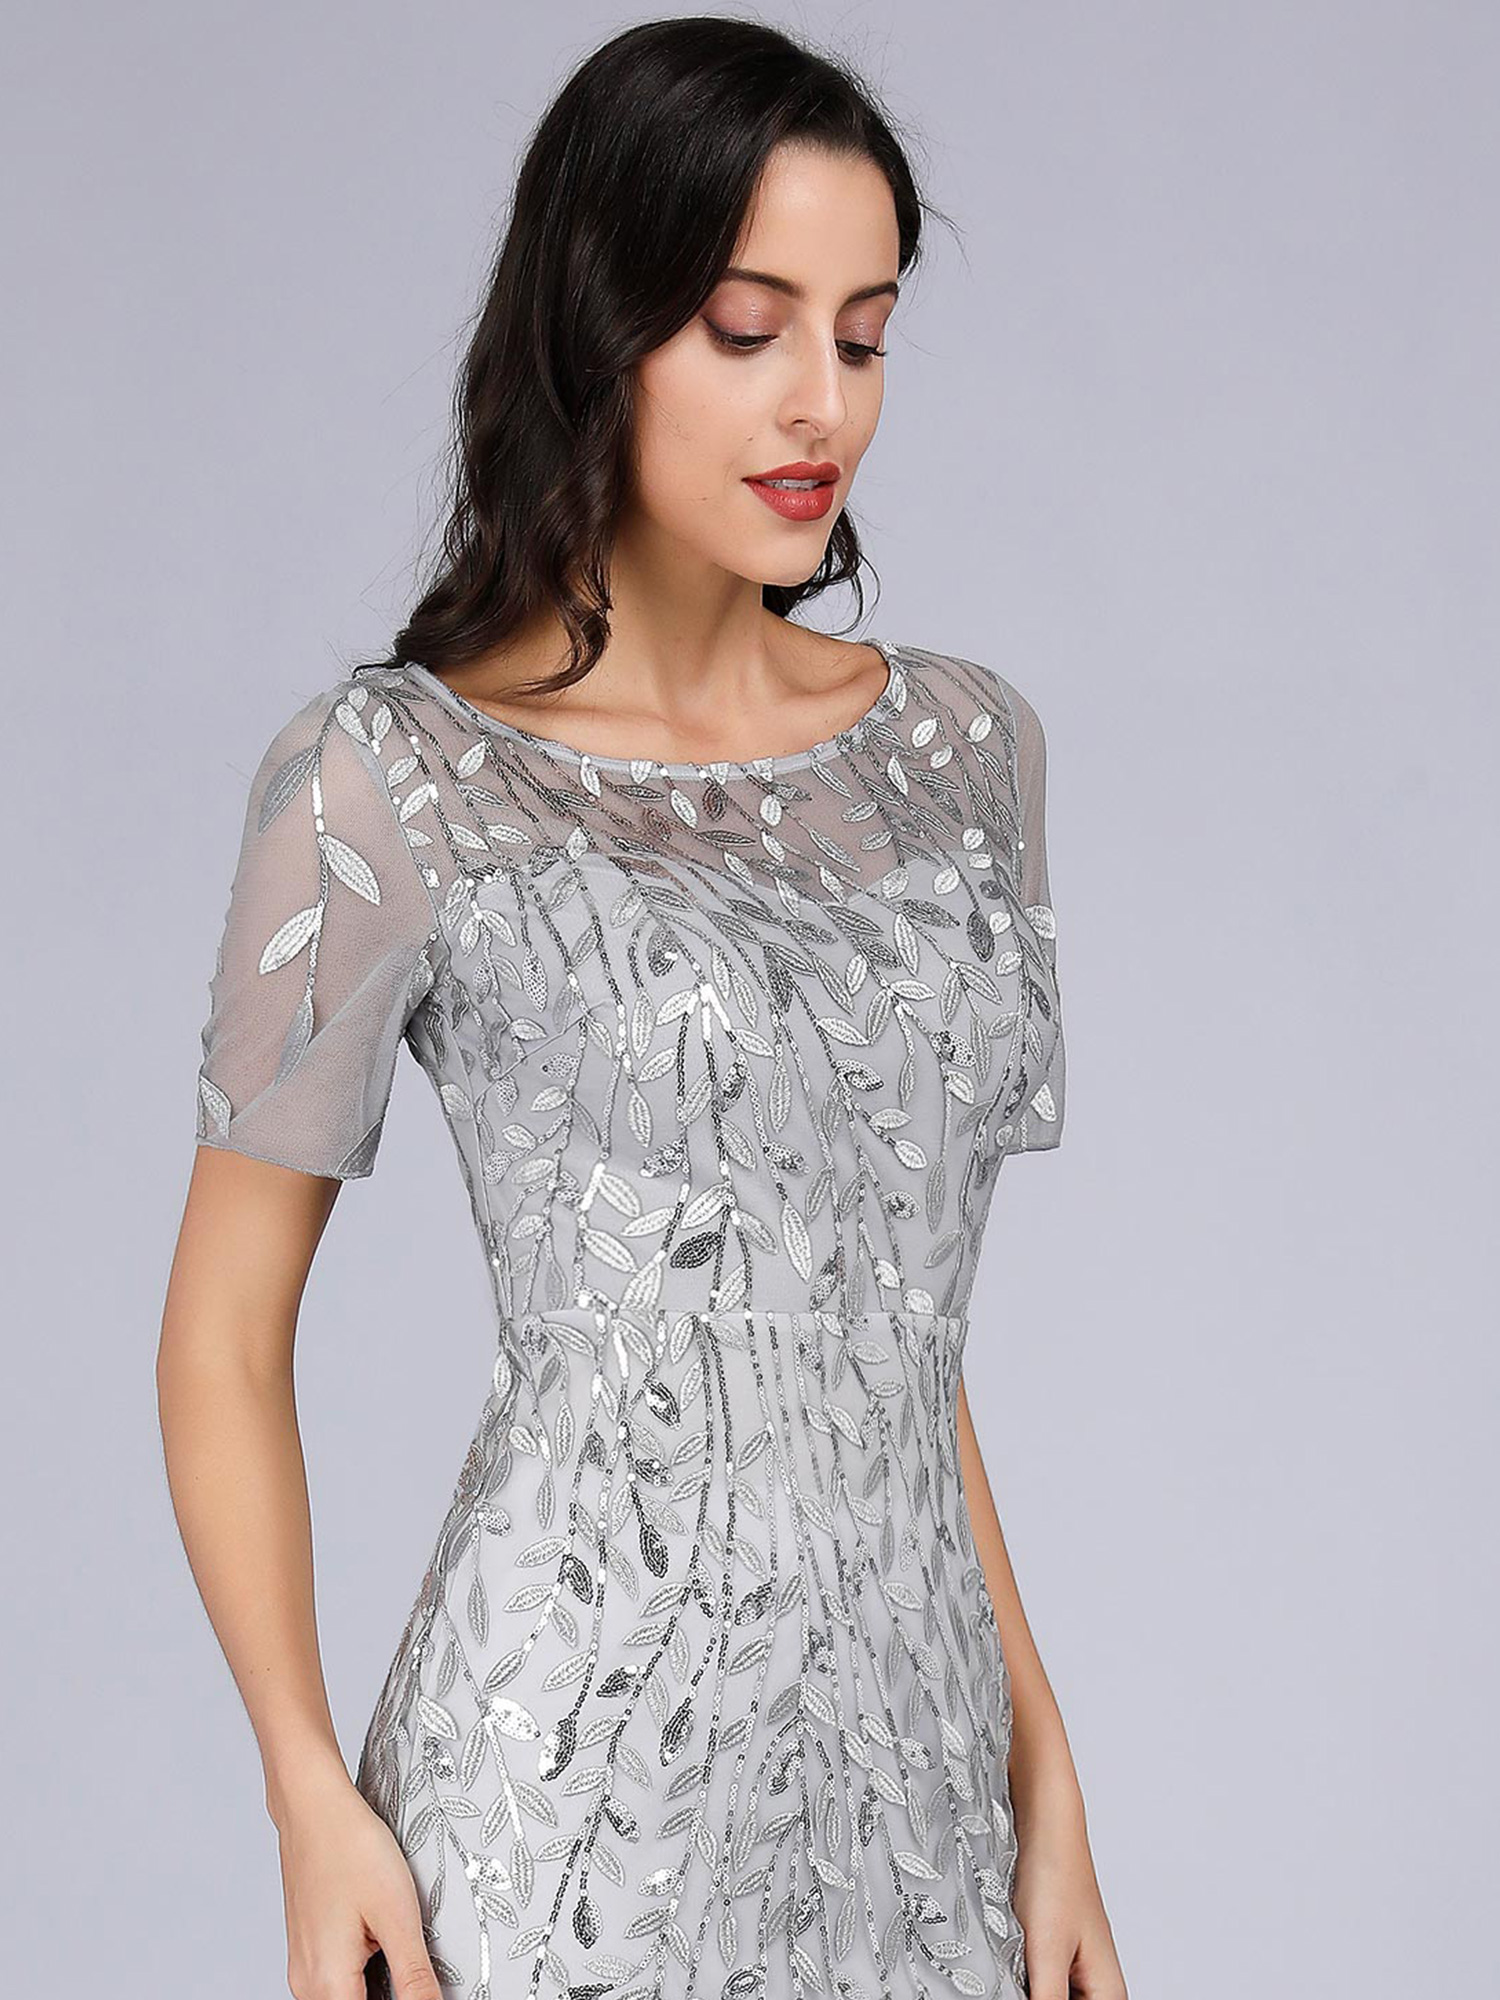 Ever-Pretty-Silver-Bridesmaid-Dresses-Fishtail-Mesh-Applique-Evening-Gown-Maxi miniature 8